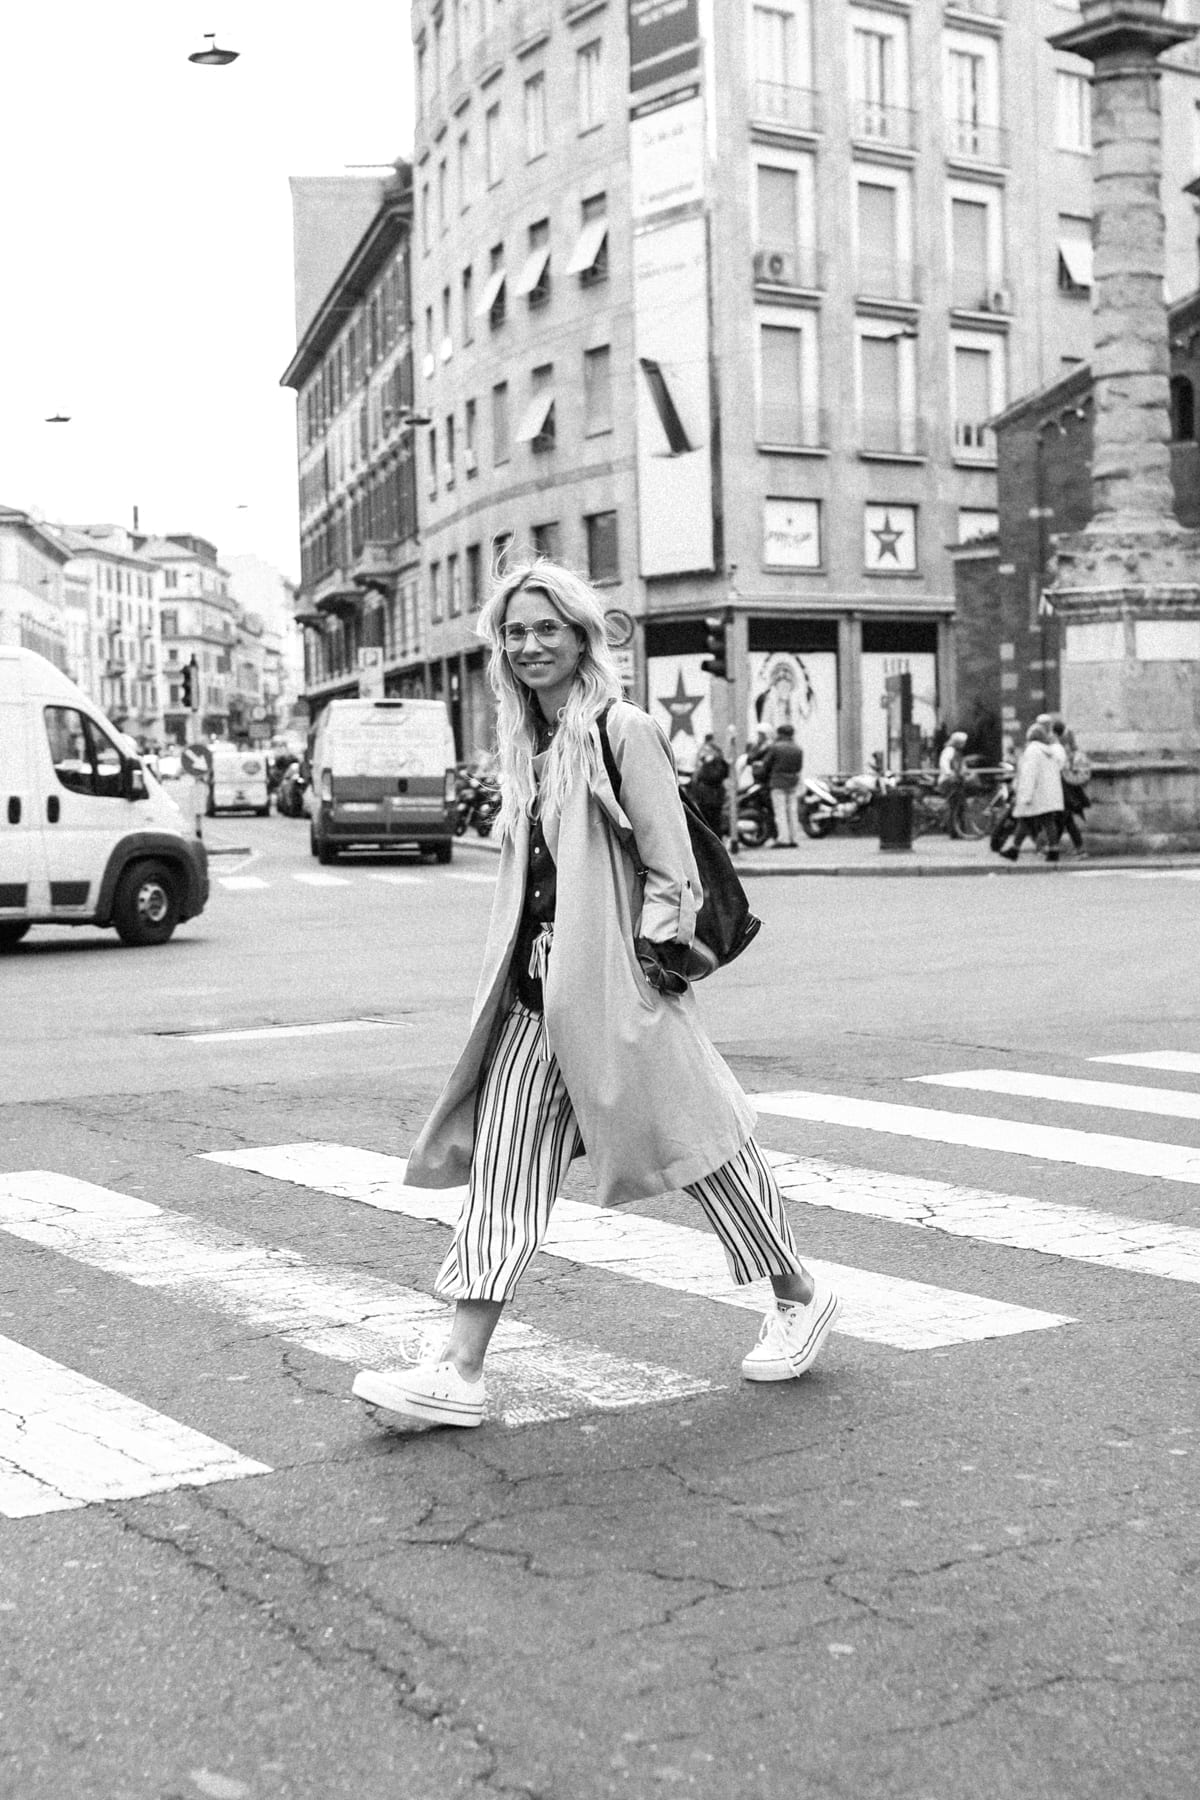 CK_1604_Constantly-K-milano-street-style-fashion-eataly-3547